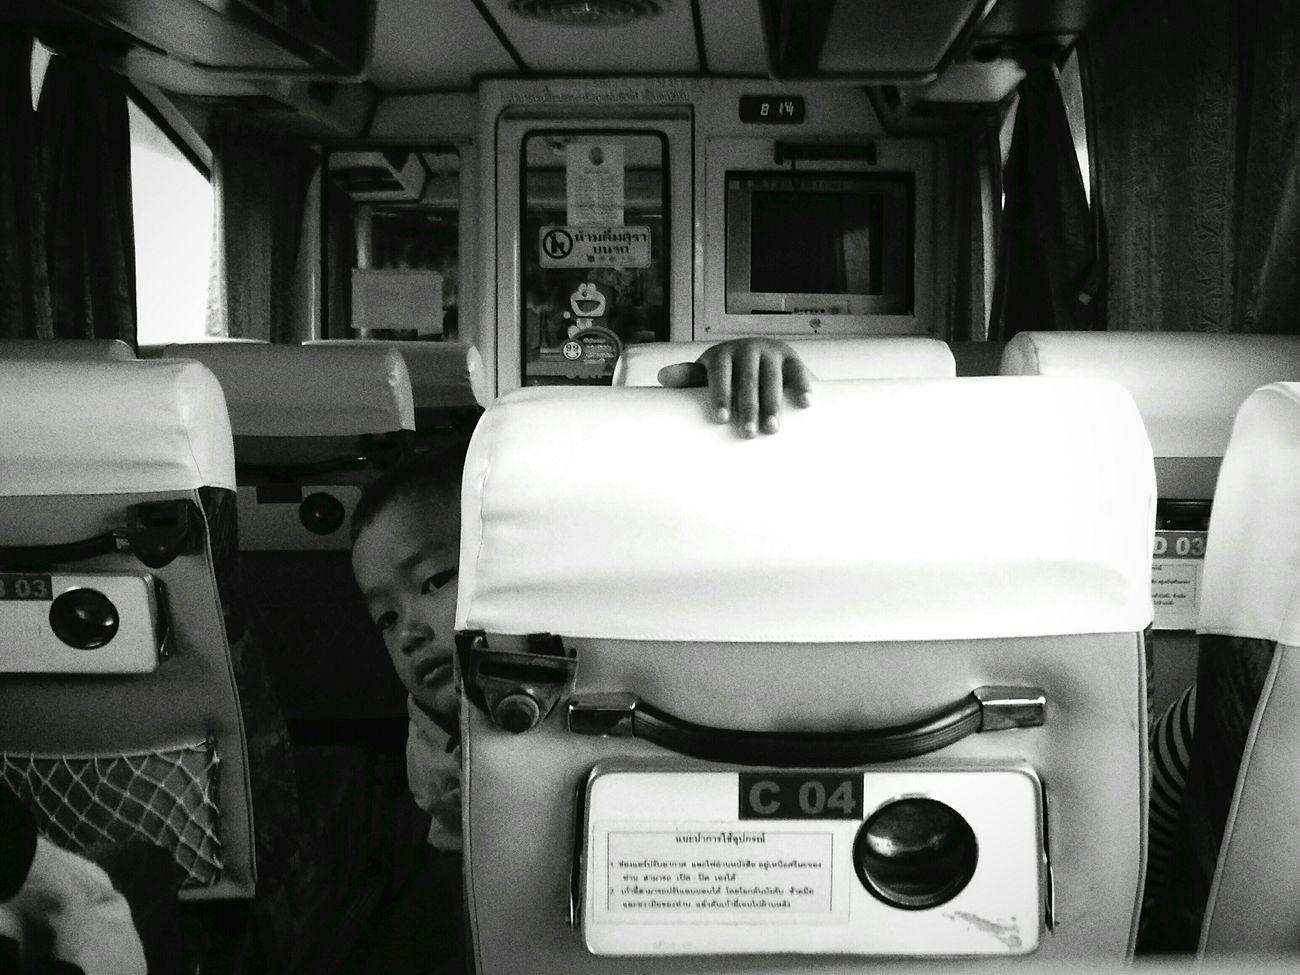 Companion PhonePhotography Oppofind7 Streetphotography Blackandwhite On Tour Boy Tourbus